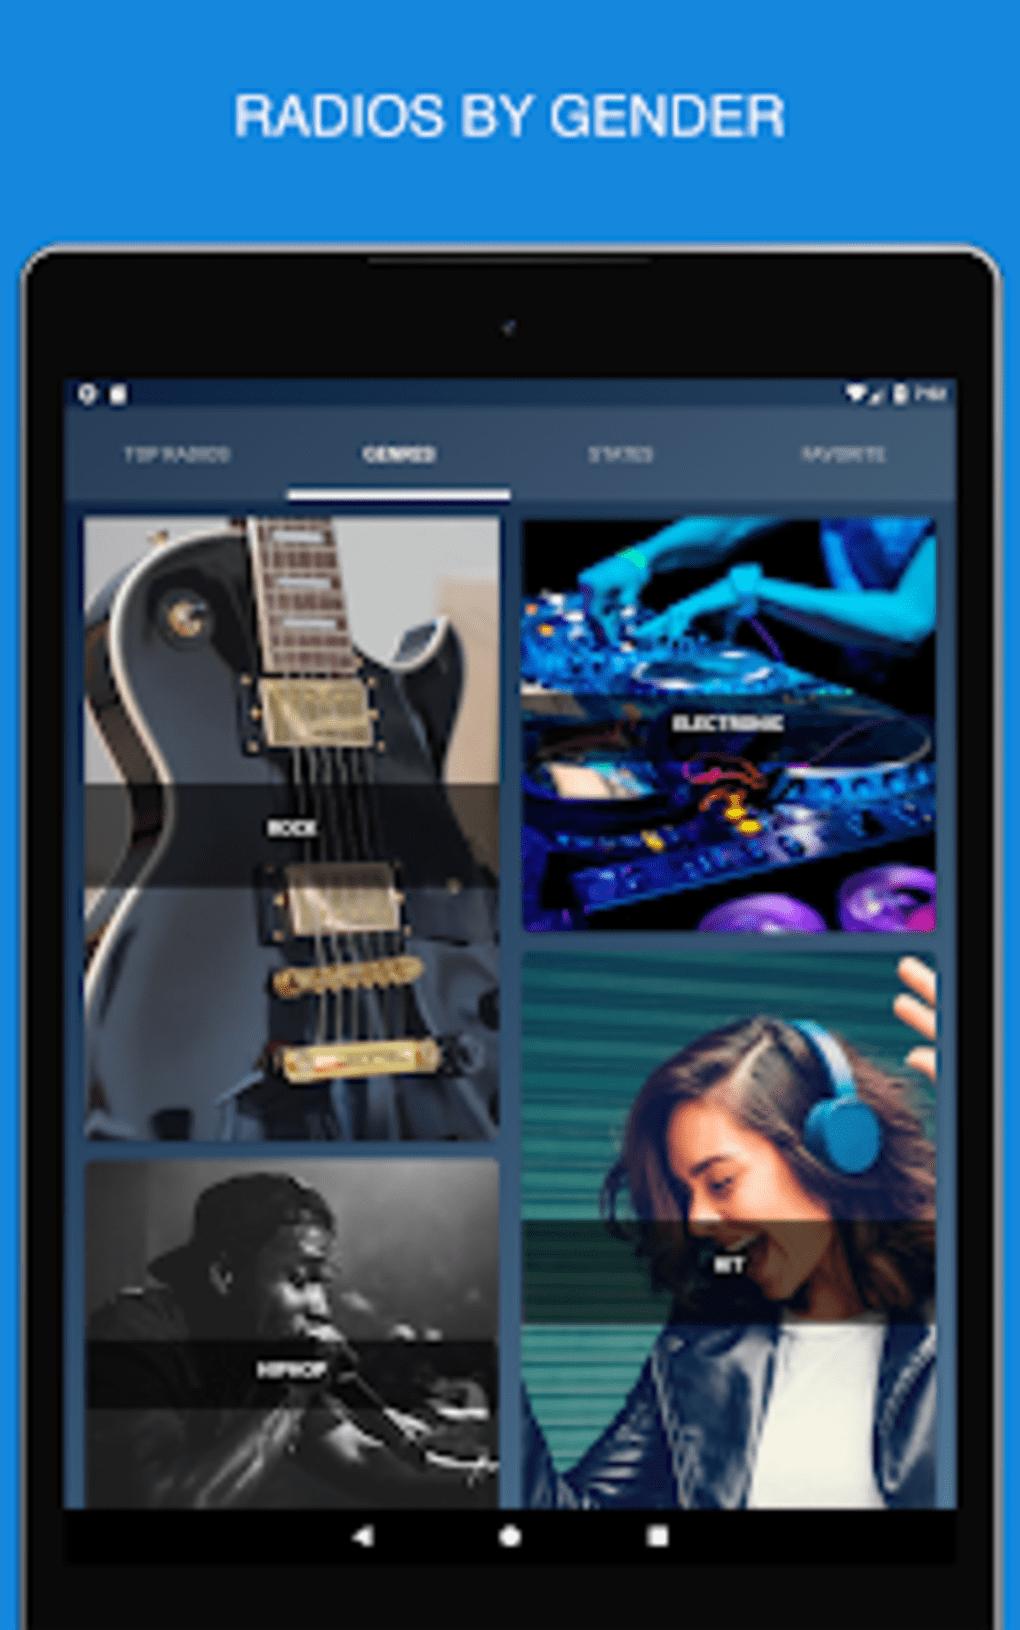 BBC iPlayer Radio 4 App UK Free for Android - Download